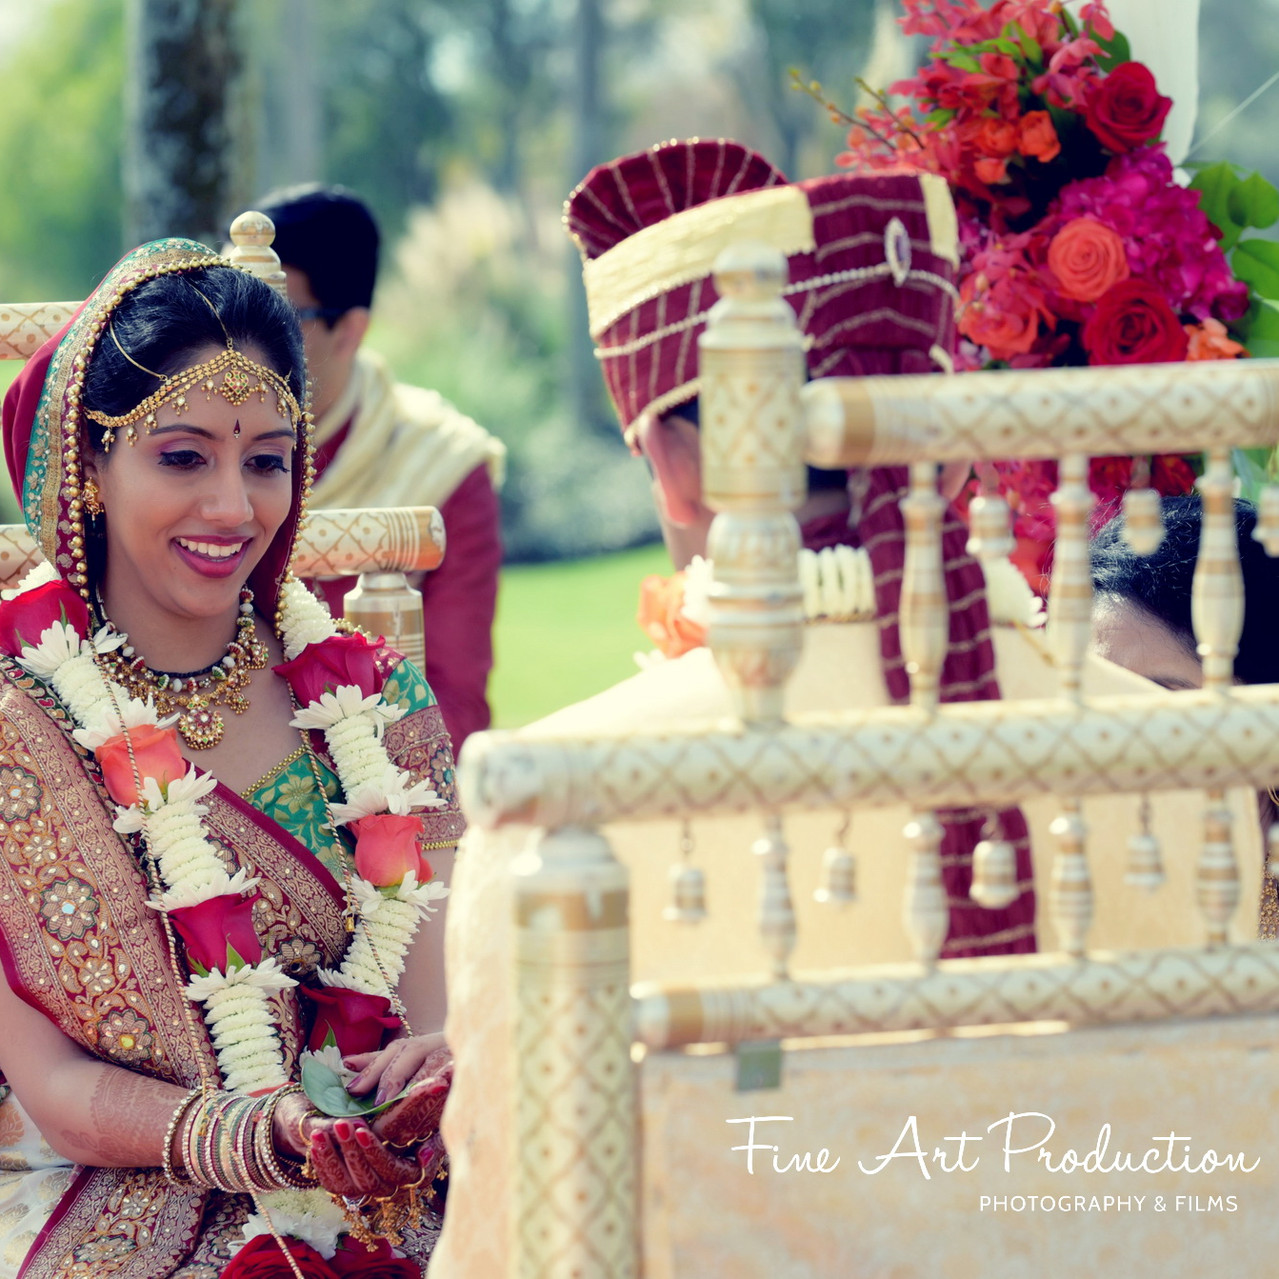 Hyatt-Regency-Grand-Cypress-Indian-Wedding-Photography-Fine-Art-Production-Amish-Thakkar_56